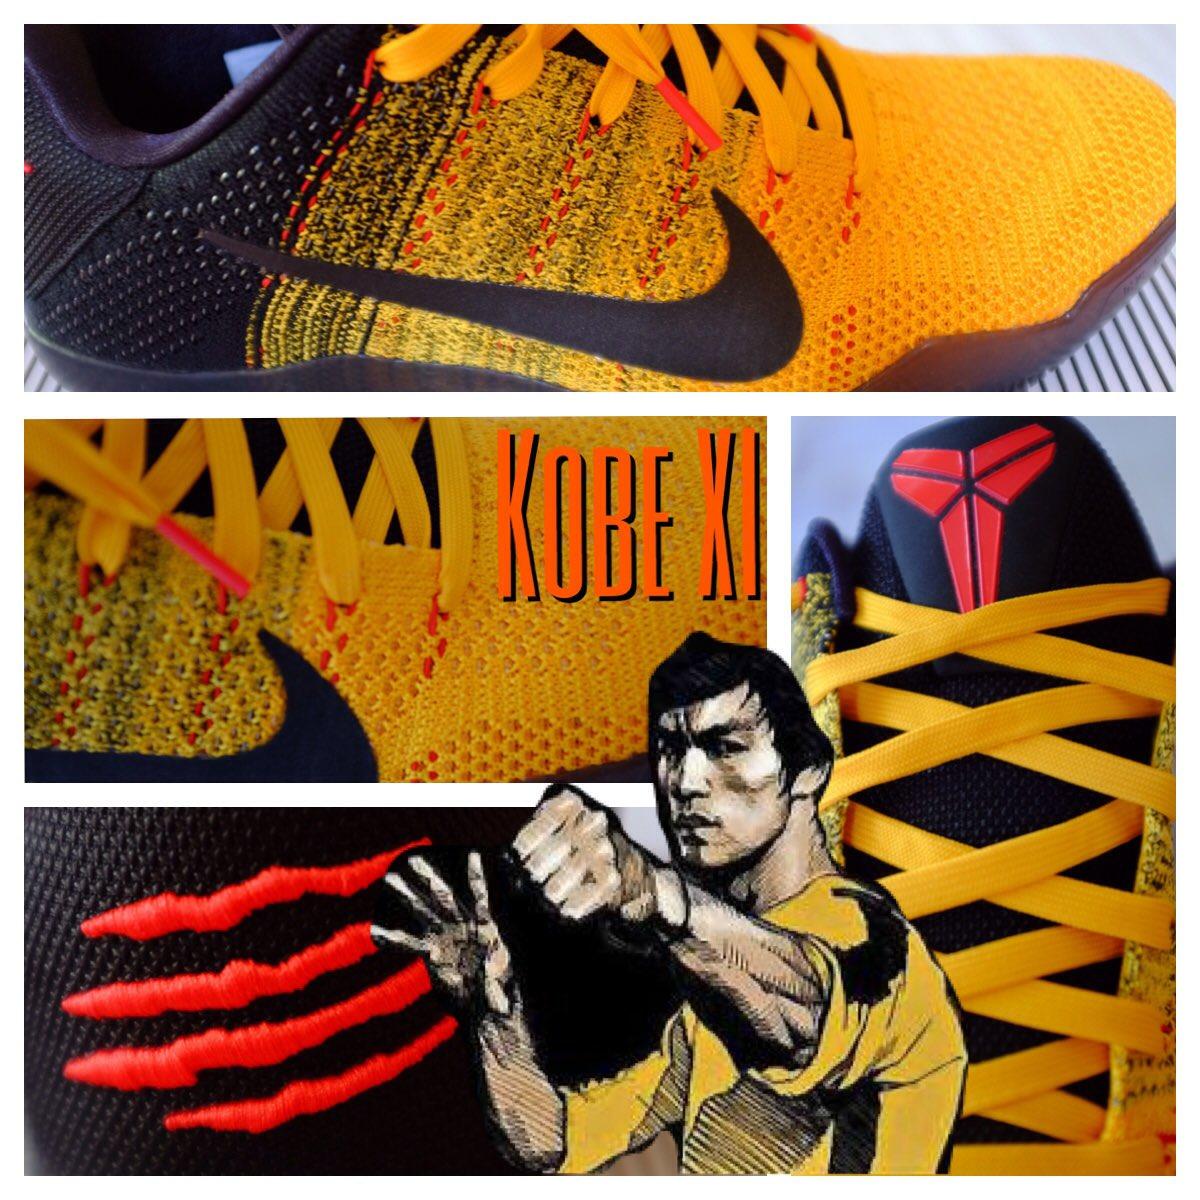 Luv my new #kicks #kobe11 #BruceLee #Nike @kobebryant @nikebasketball https://t.co/L0cPVdkNl4